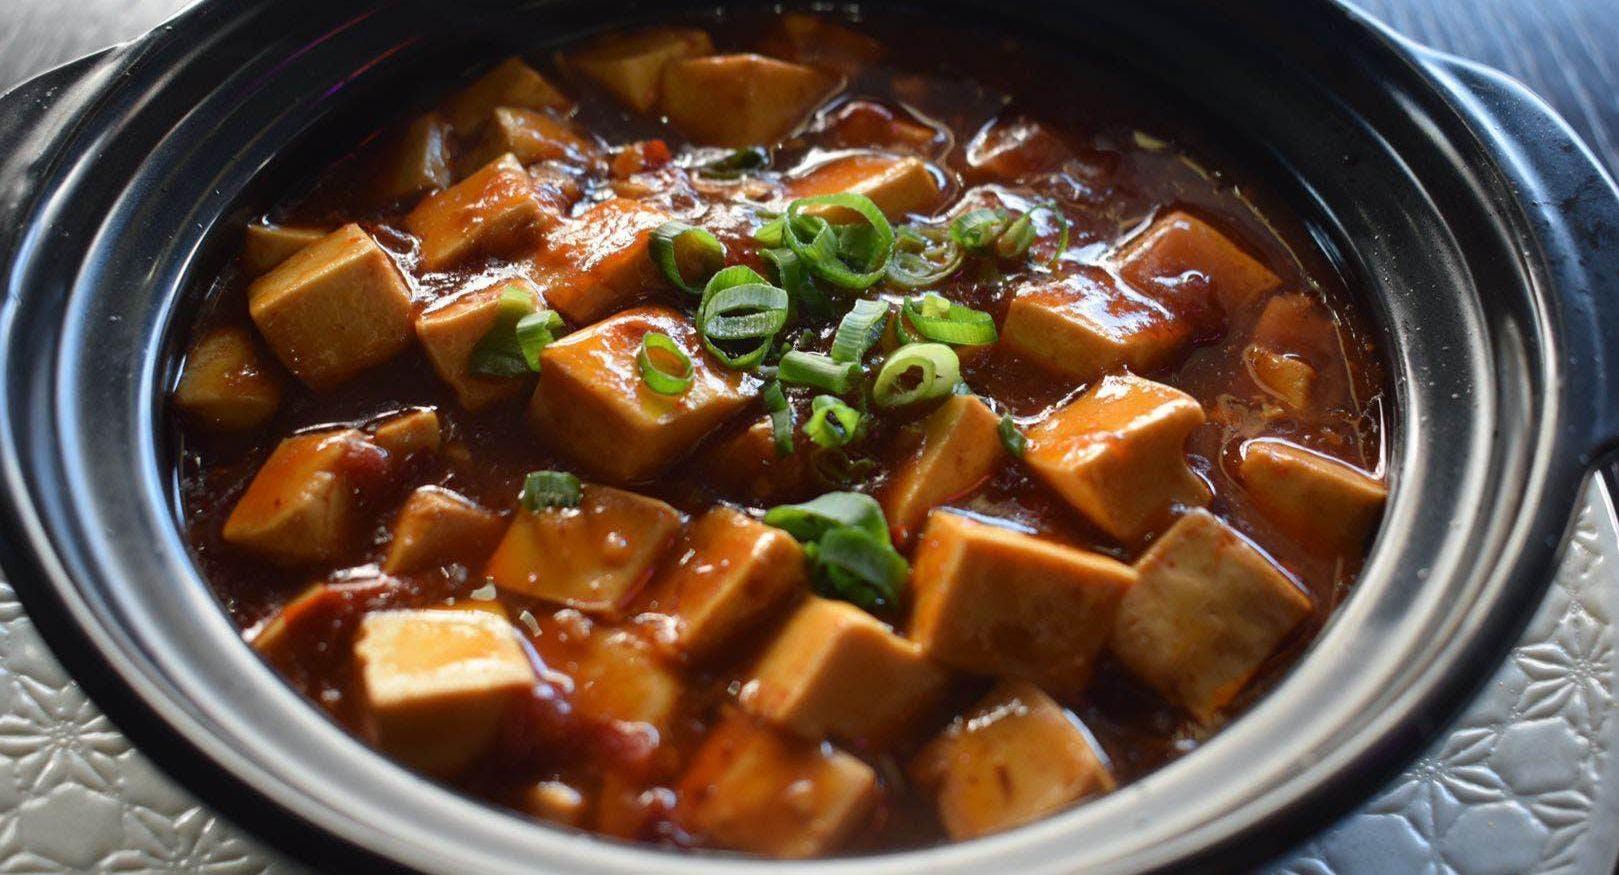 Tian's Food 柳泉小厨 Sydney image 1